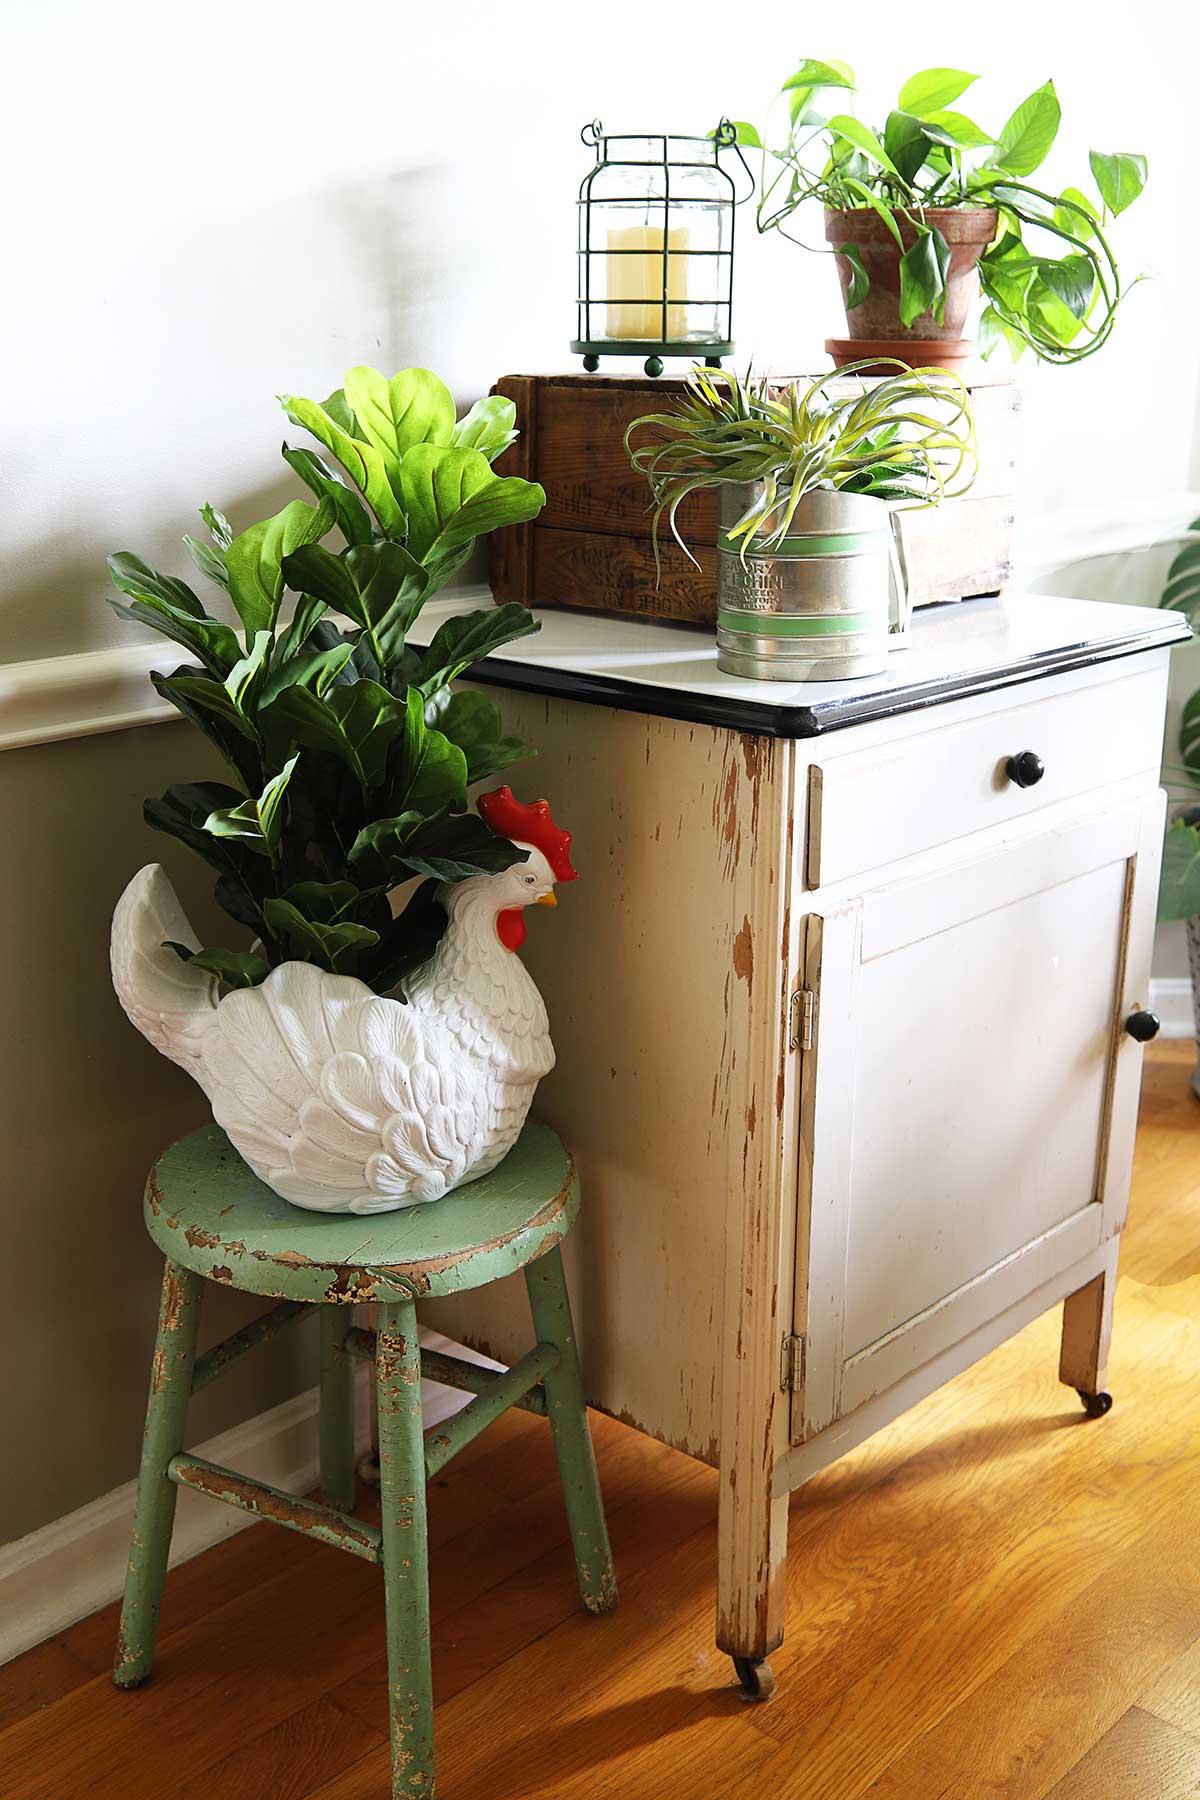 farmhouse vignette using vintage kitchen cabinet with enamel top